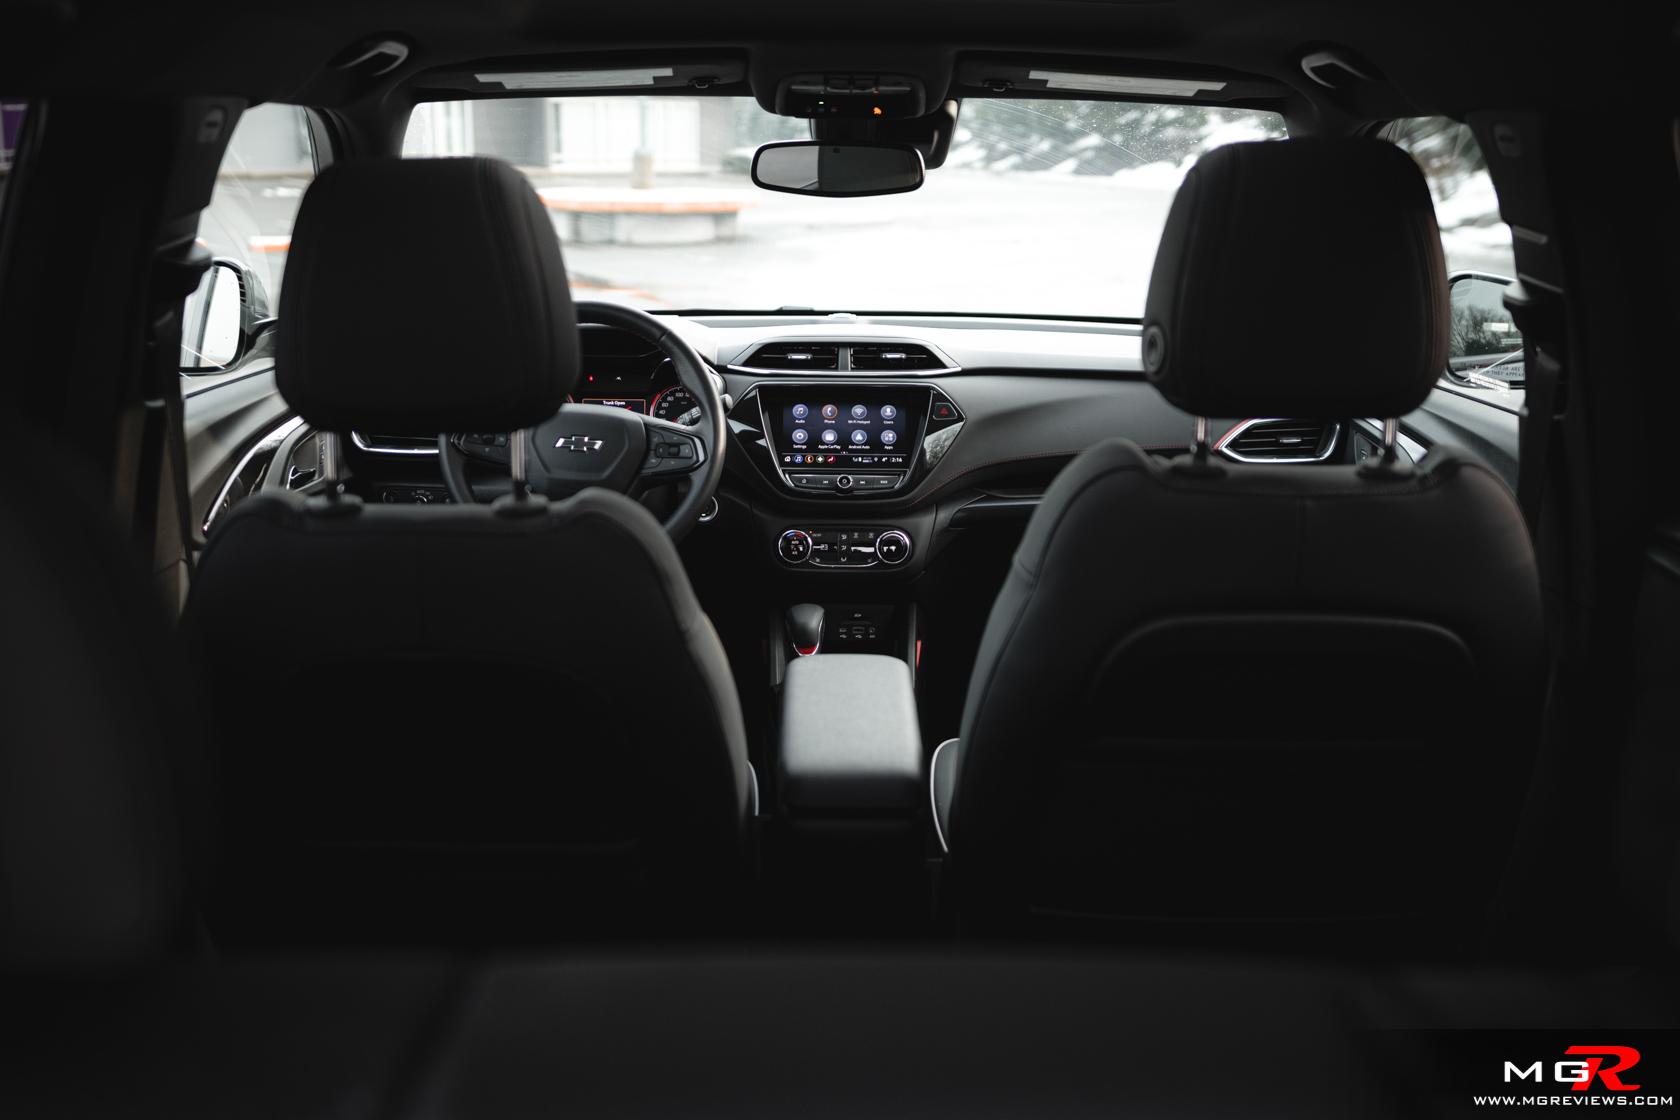 2021 Chevrolet Trailblazer RS Interior